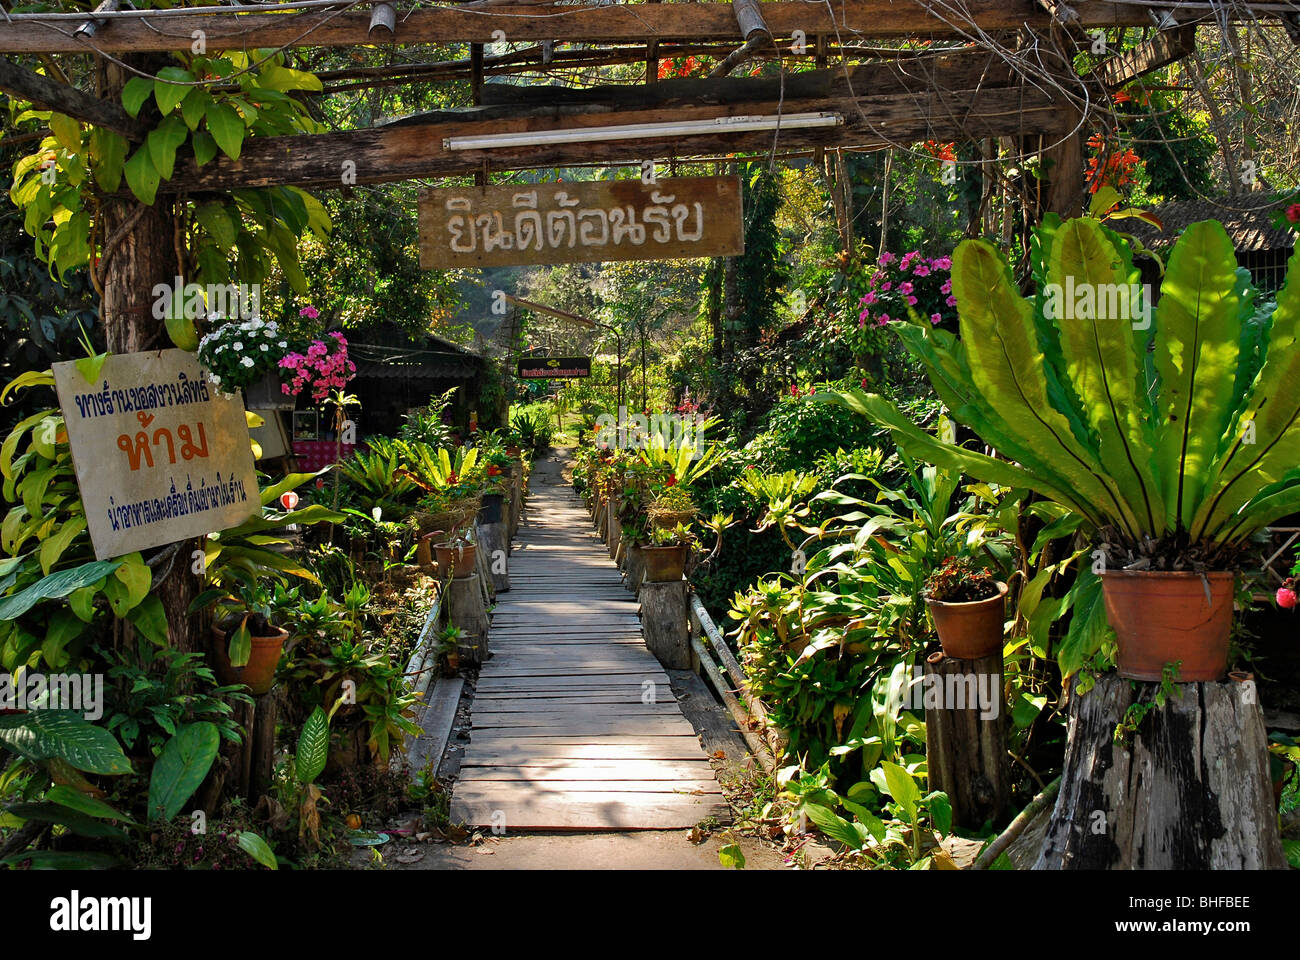 Bridge Into The Garden, Restaurant Near A Waterfall, Mae Rim Valley,  Province Chiang Mai, Thailand, Asia